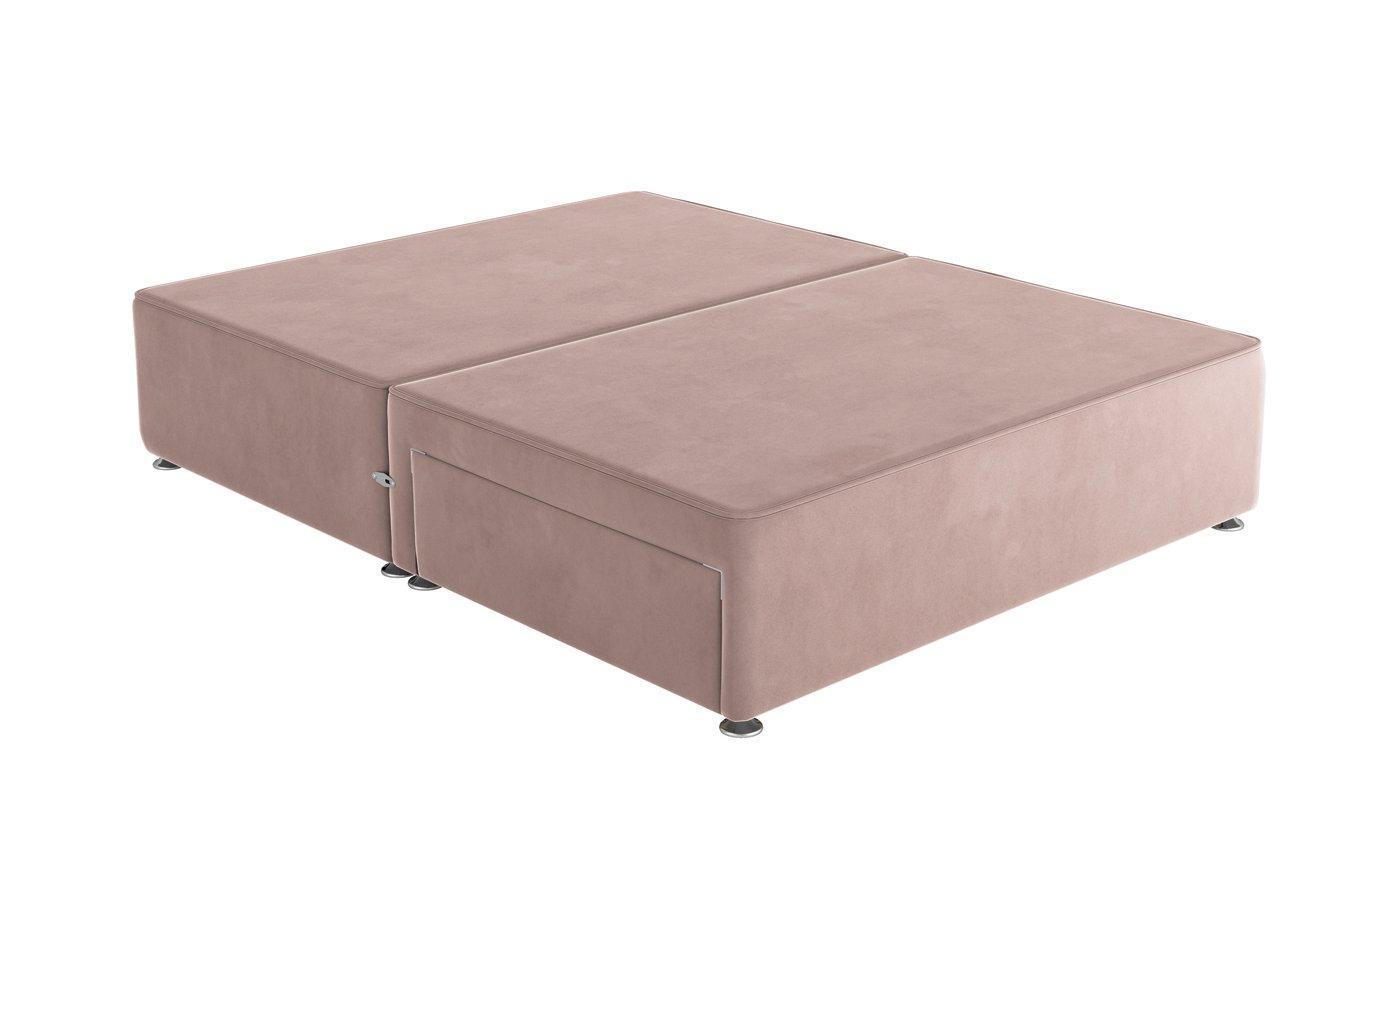 Sleepeezee 4'0 P/T 2 Drw Base Plush Pink 4'0 Small double